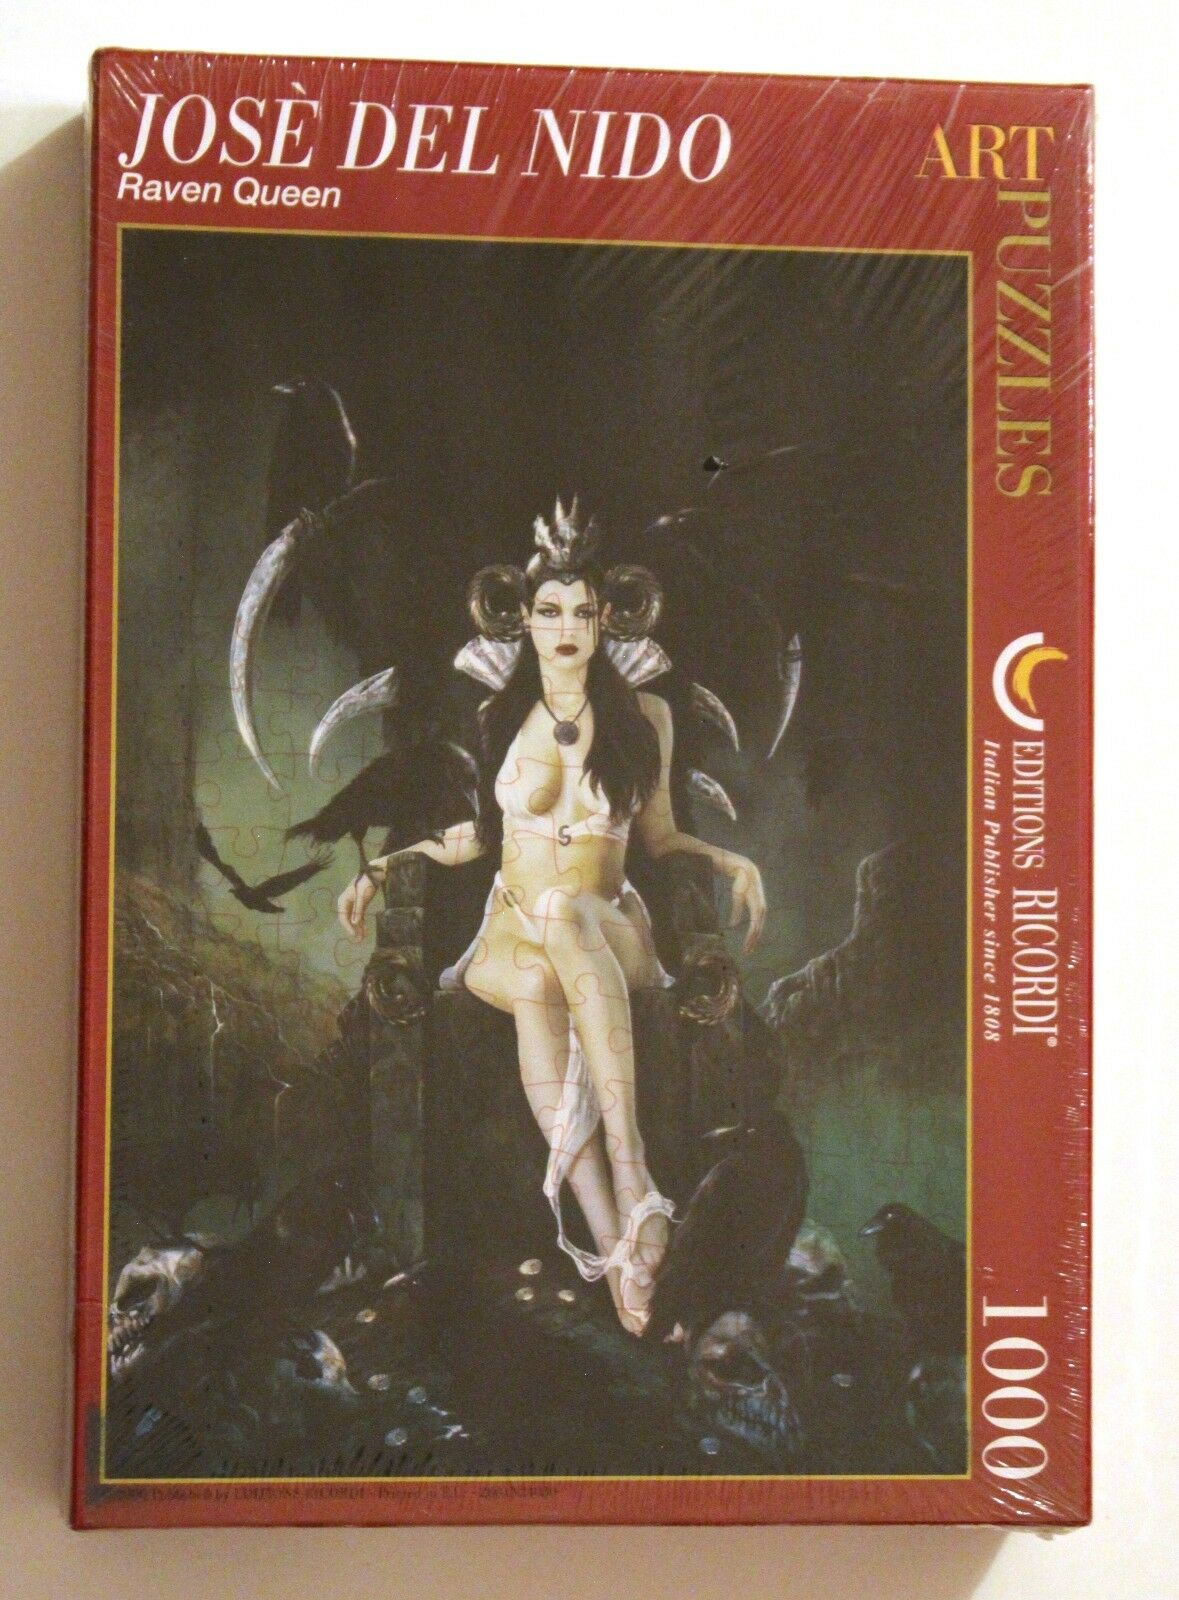 2010 ediziones  Ricordi RAVEN regina Puzzle JOSÉ DEL NIDO 1000 pcs SEALED & rare  vendite calde